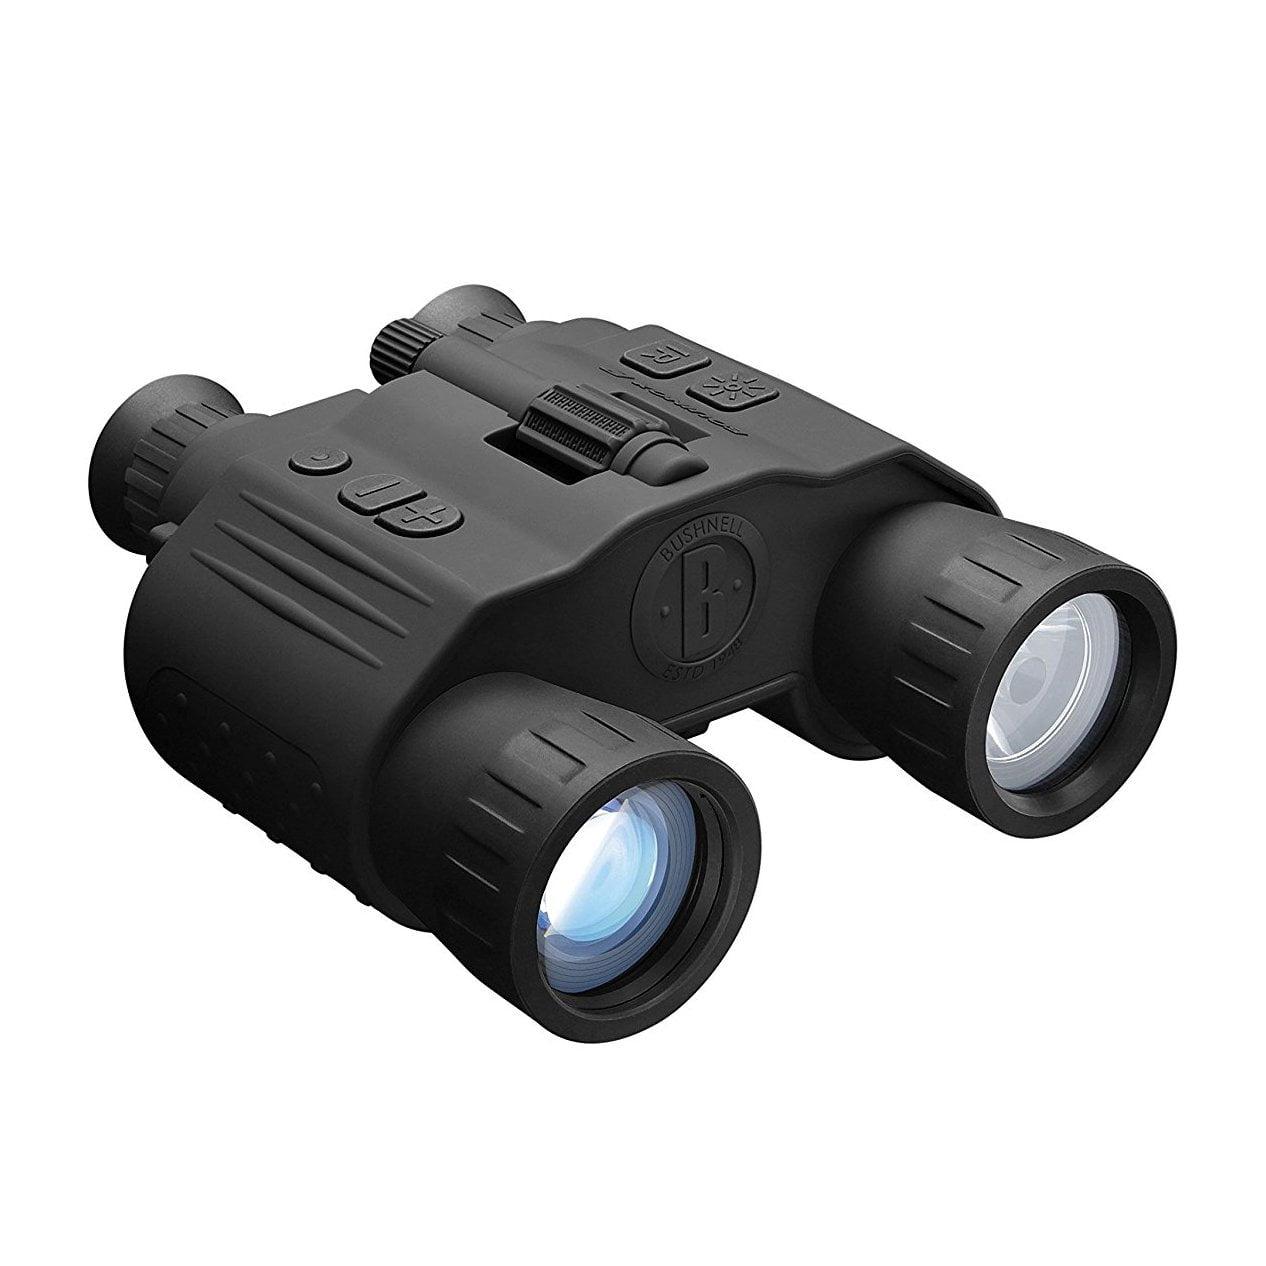 Bushnell 260500 Equinox Z 2 X40mm Binoculars With Digital Night Vision by Bushnell